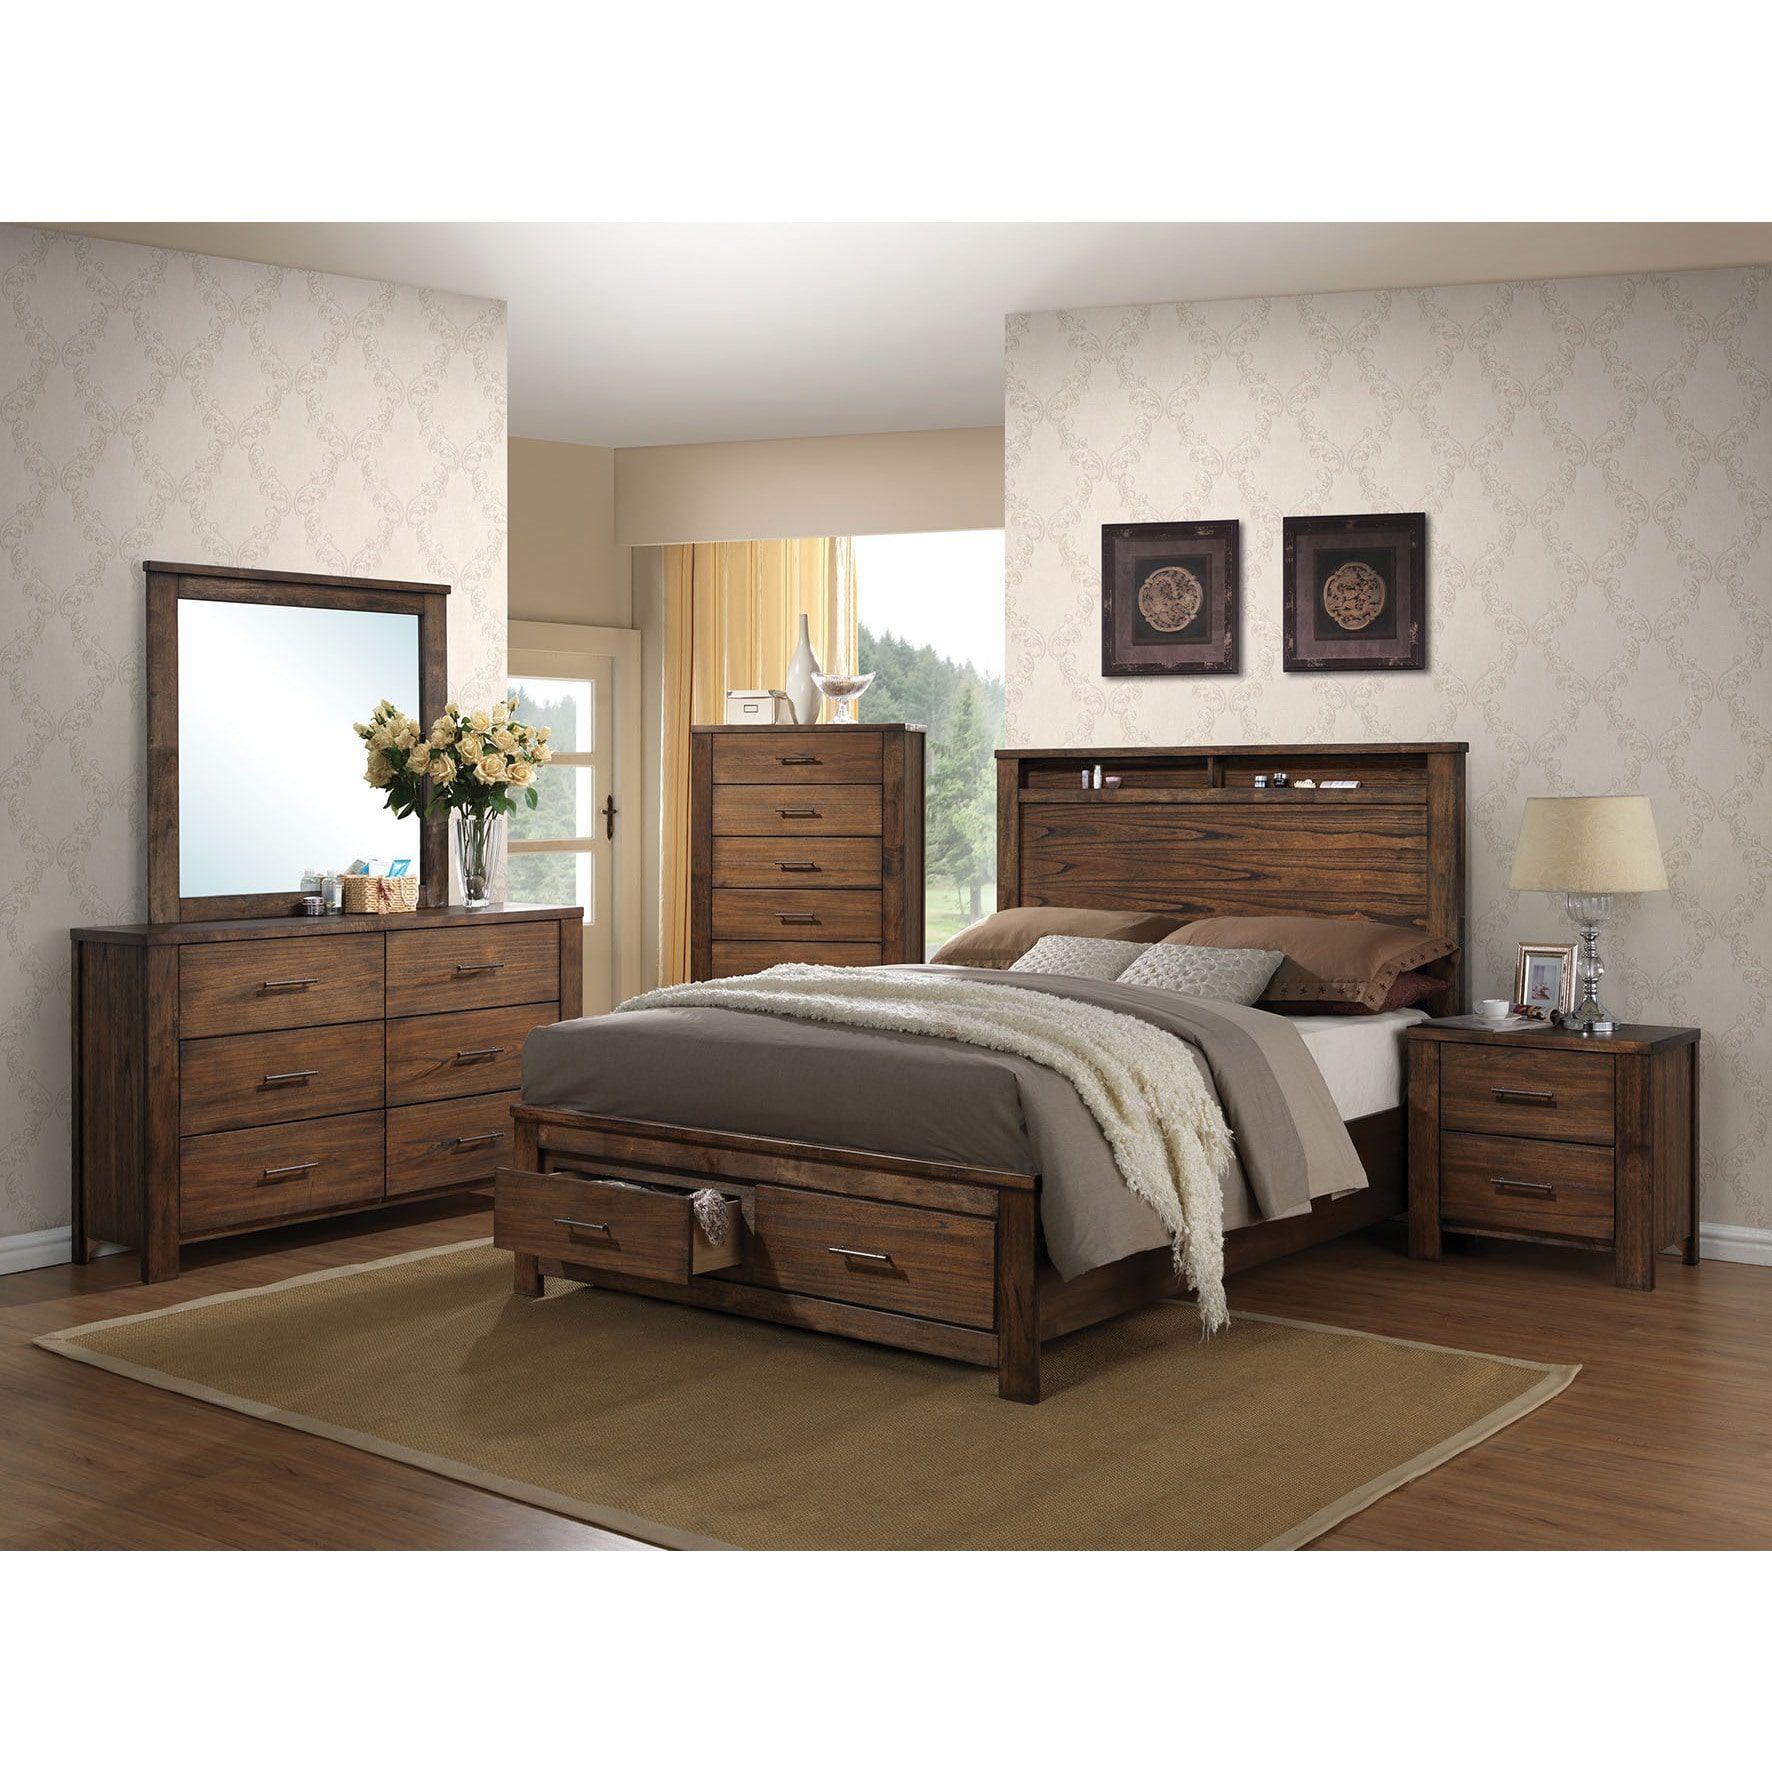 Merrilee Oak 4piece Storage Bedroom Set